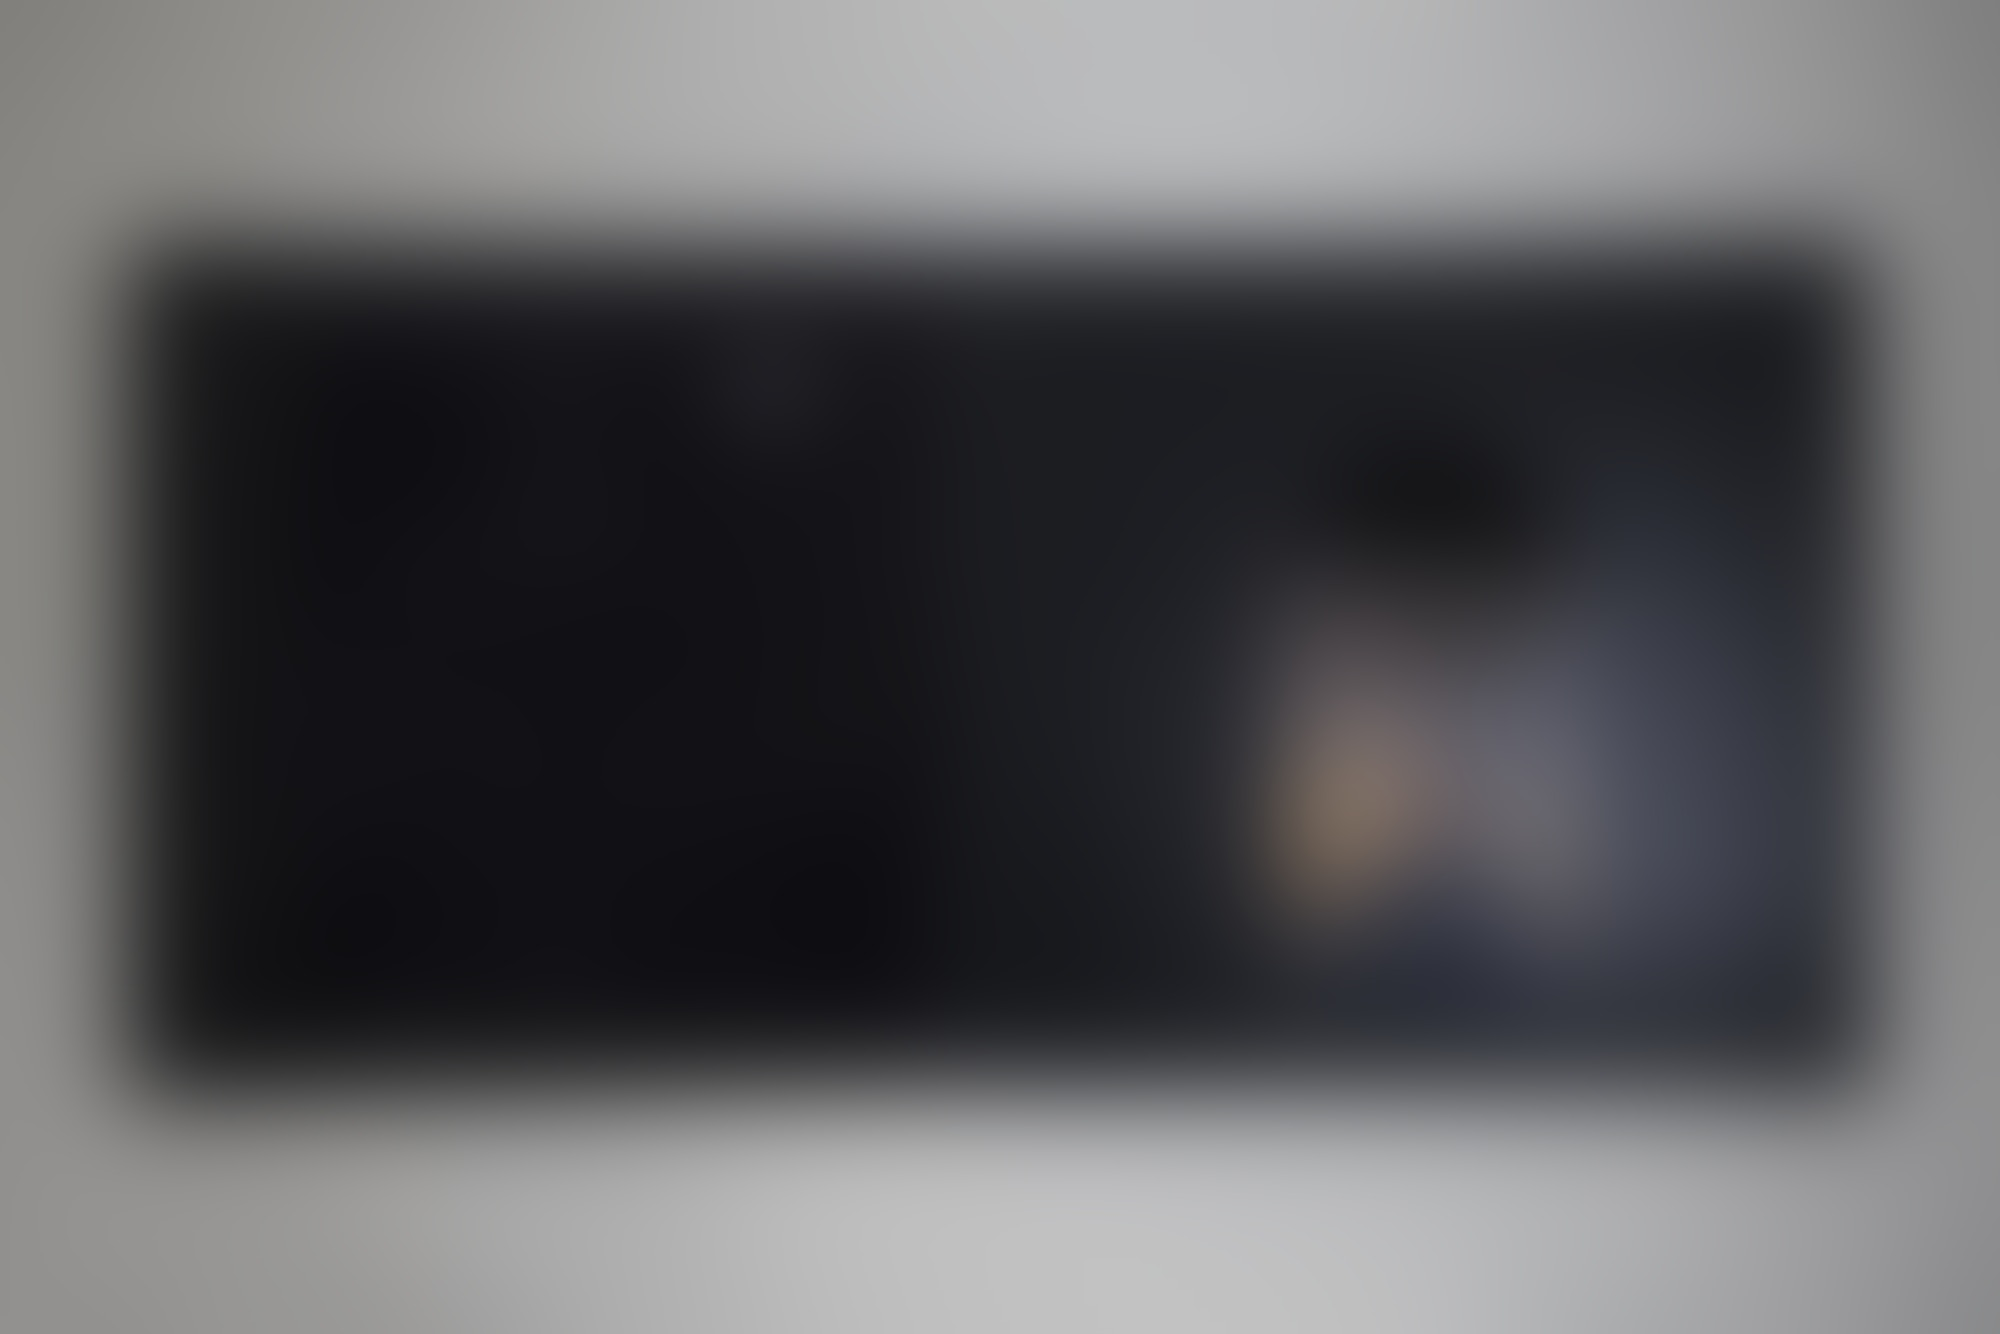 DB Blackstar 15 1000x667 autocompressfitresizeixlibphp 1 1 0max h2000max w3 D2000q80s46dd53223a785fe3471b1f4c3409719f